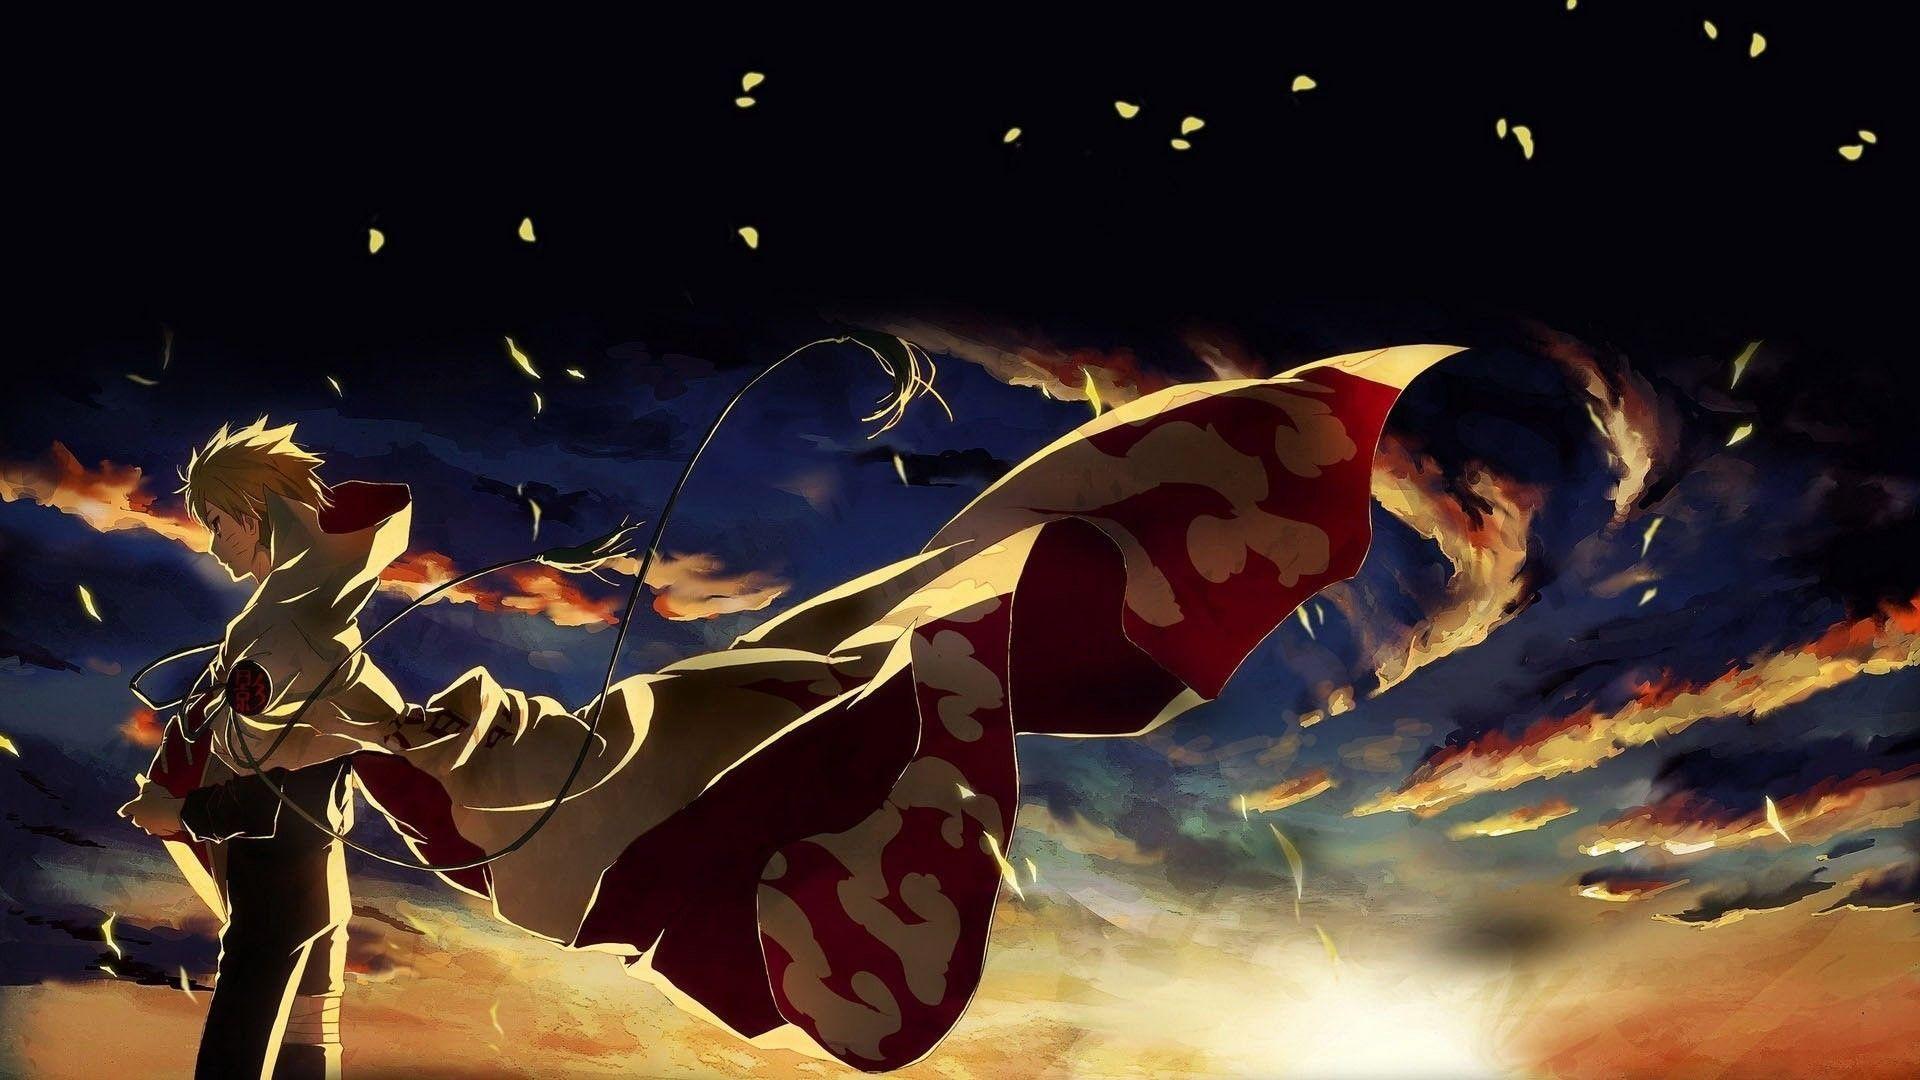 Naruto and Sasuke, Background Wallpaper